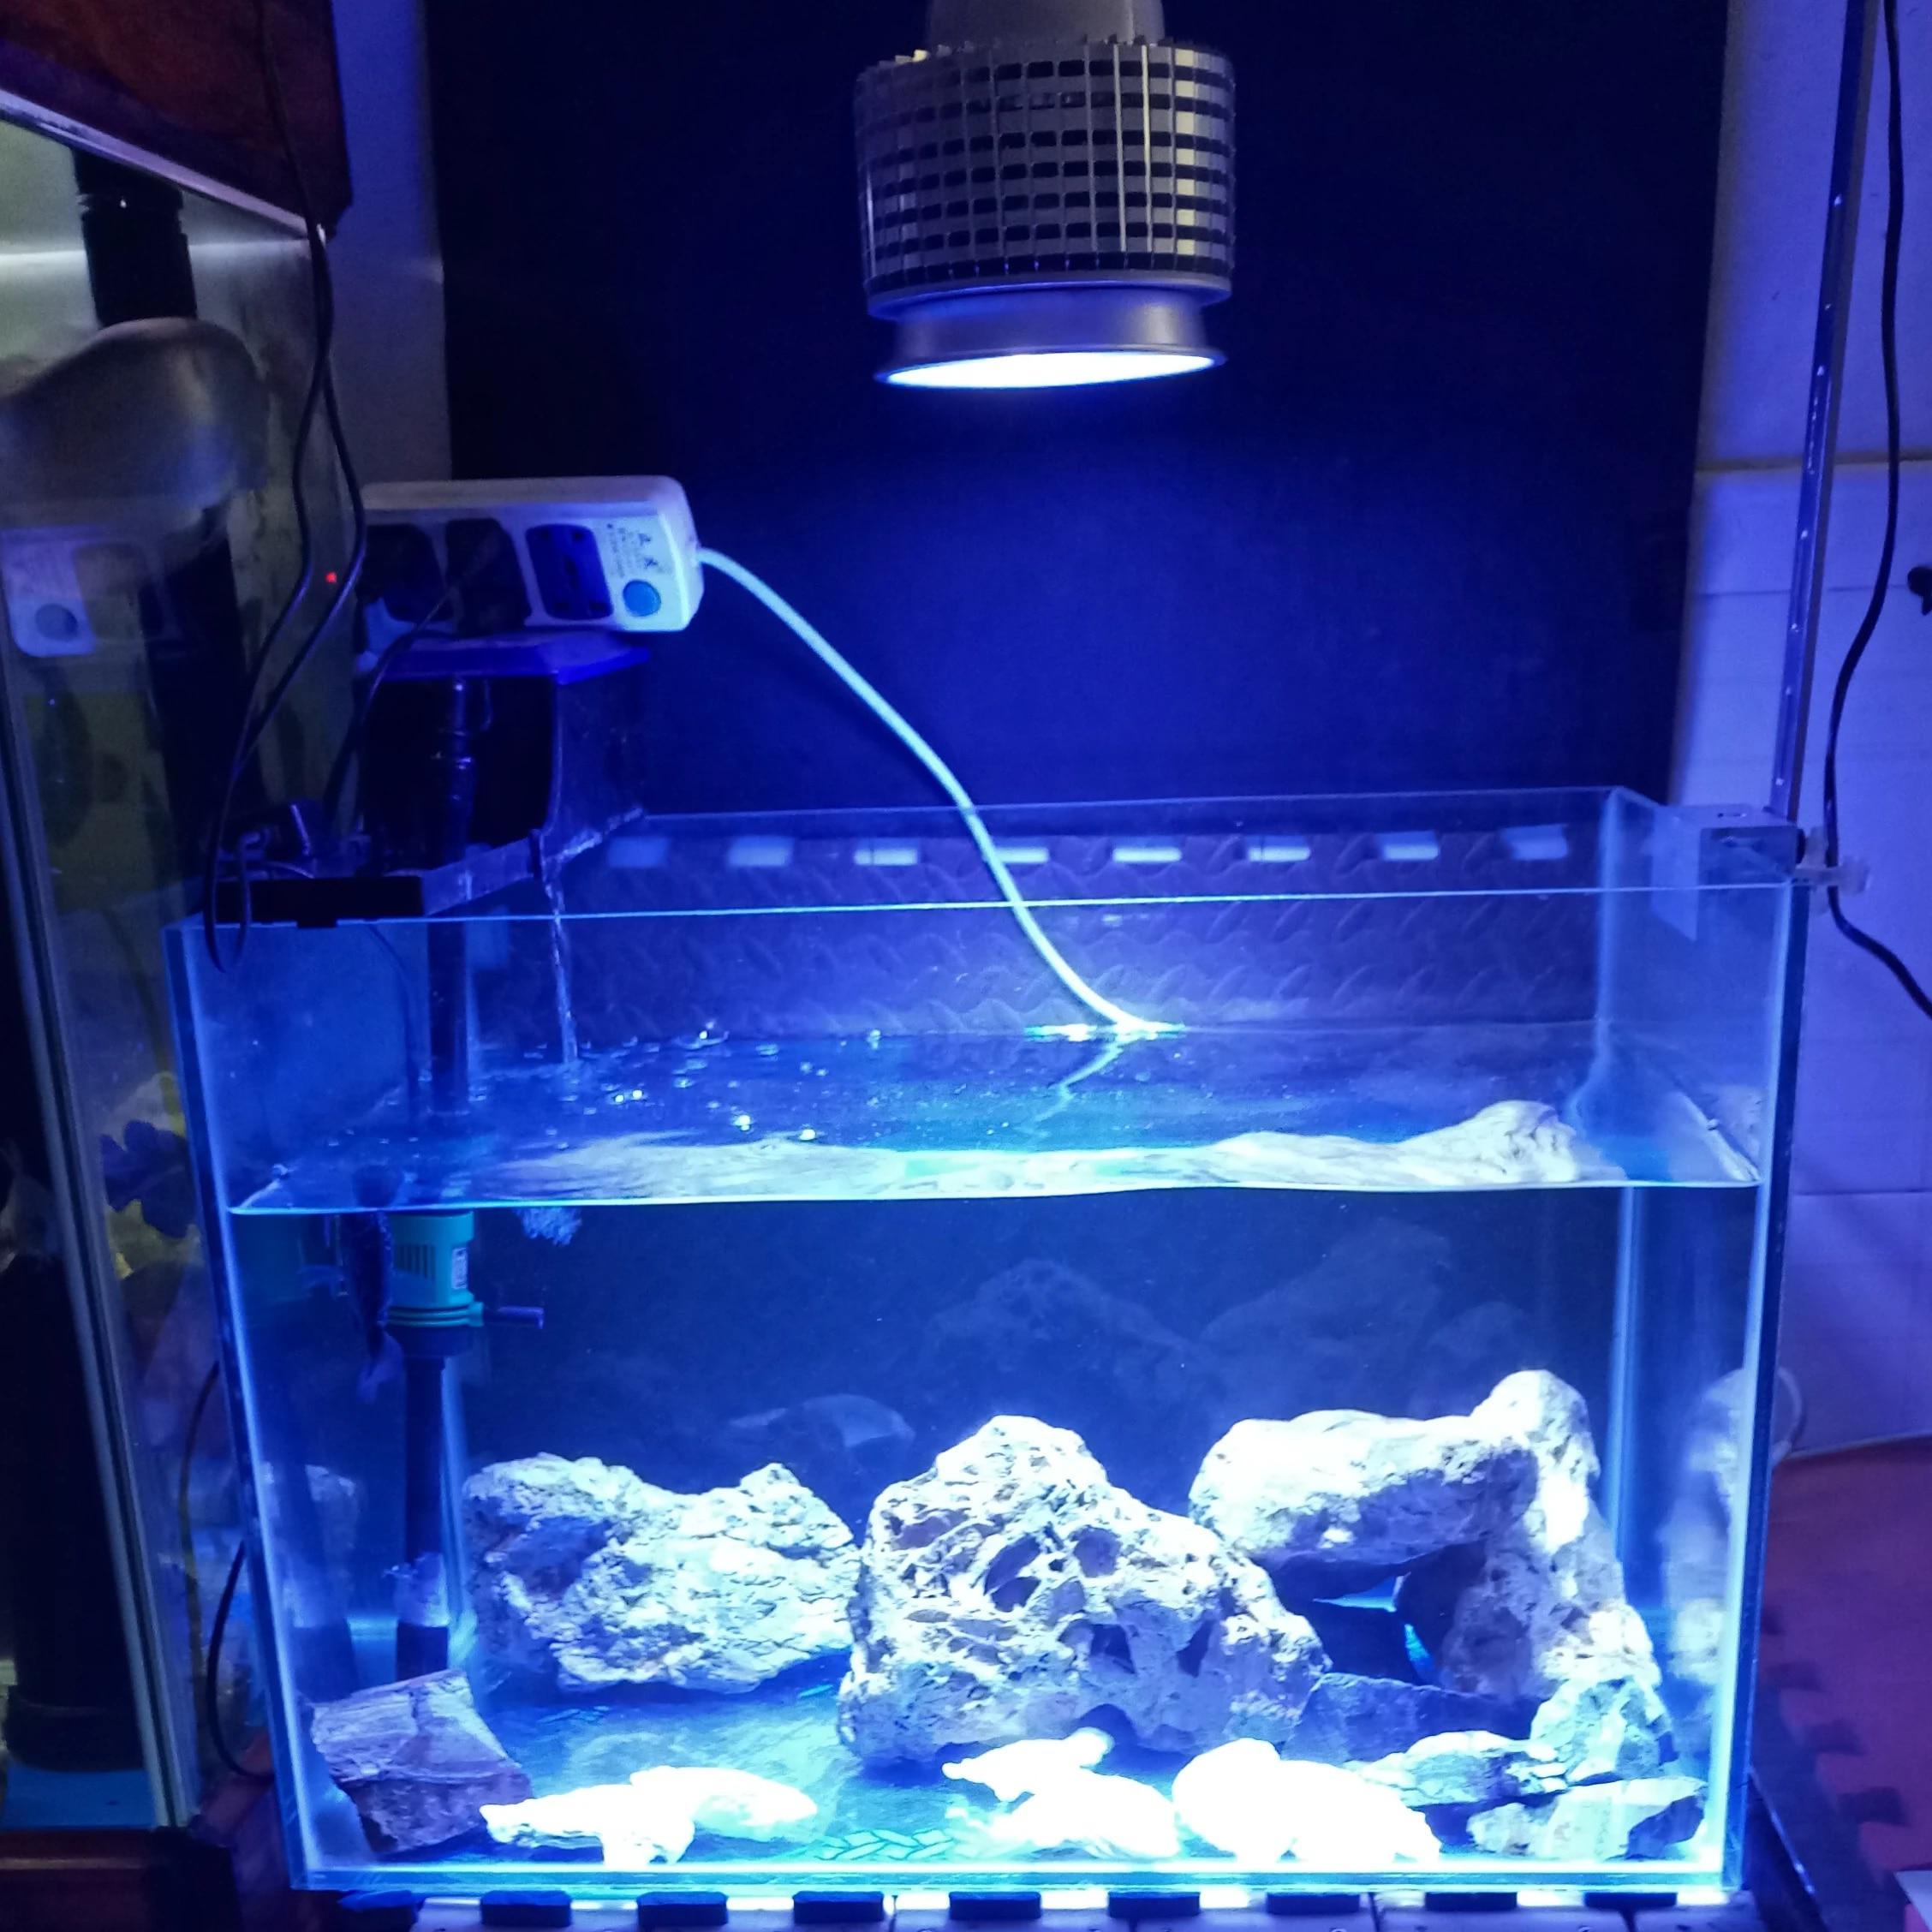 50w led aquarium lighting marine reef light grow bulb for fish coral sps lps plant nano tank